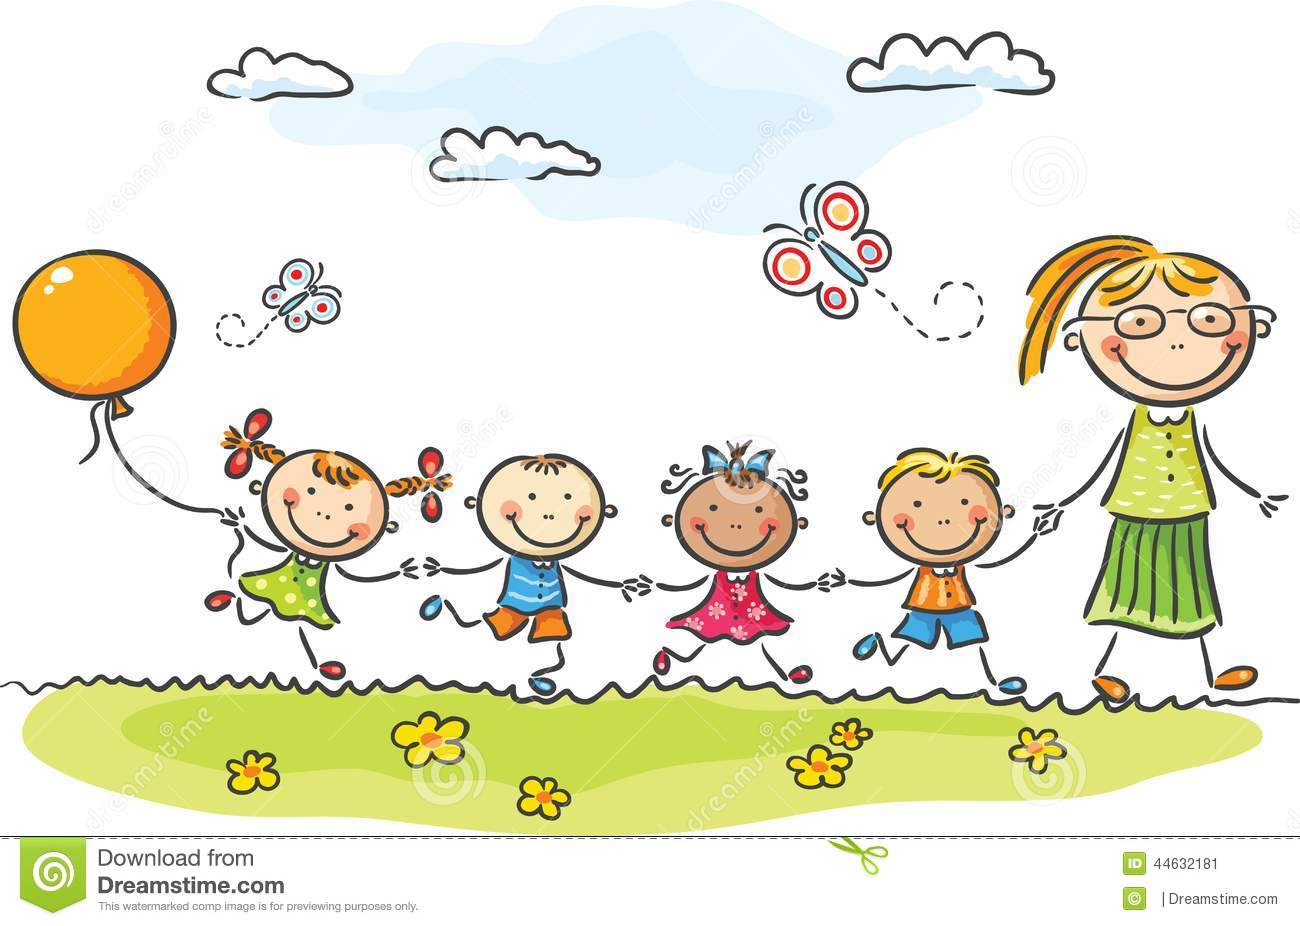 Clipart kindergarten svg library download Kindergarten pictures clip art - ClipartFest svg library download